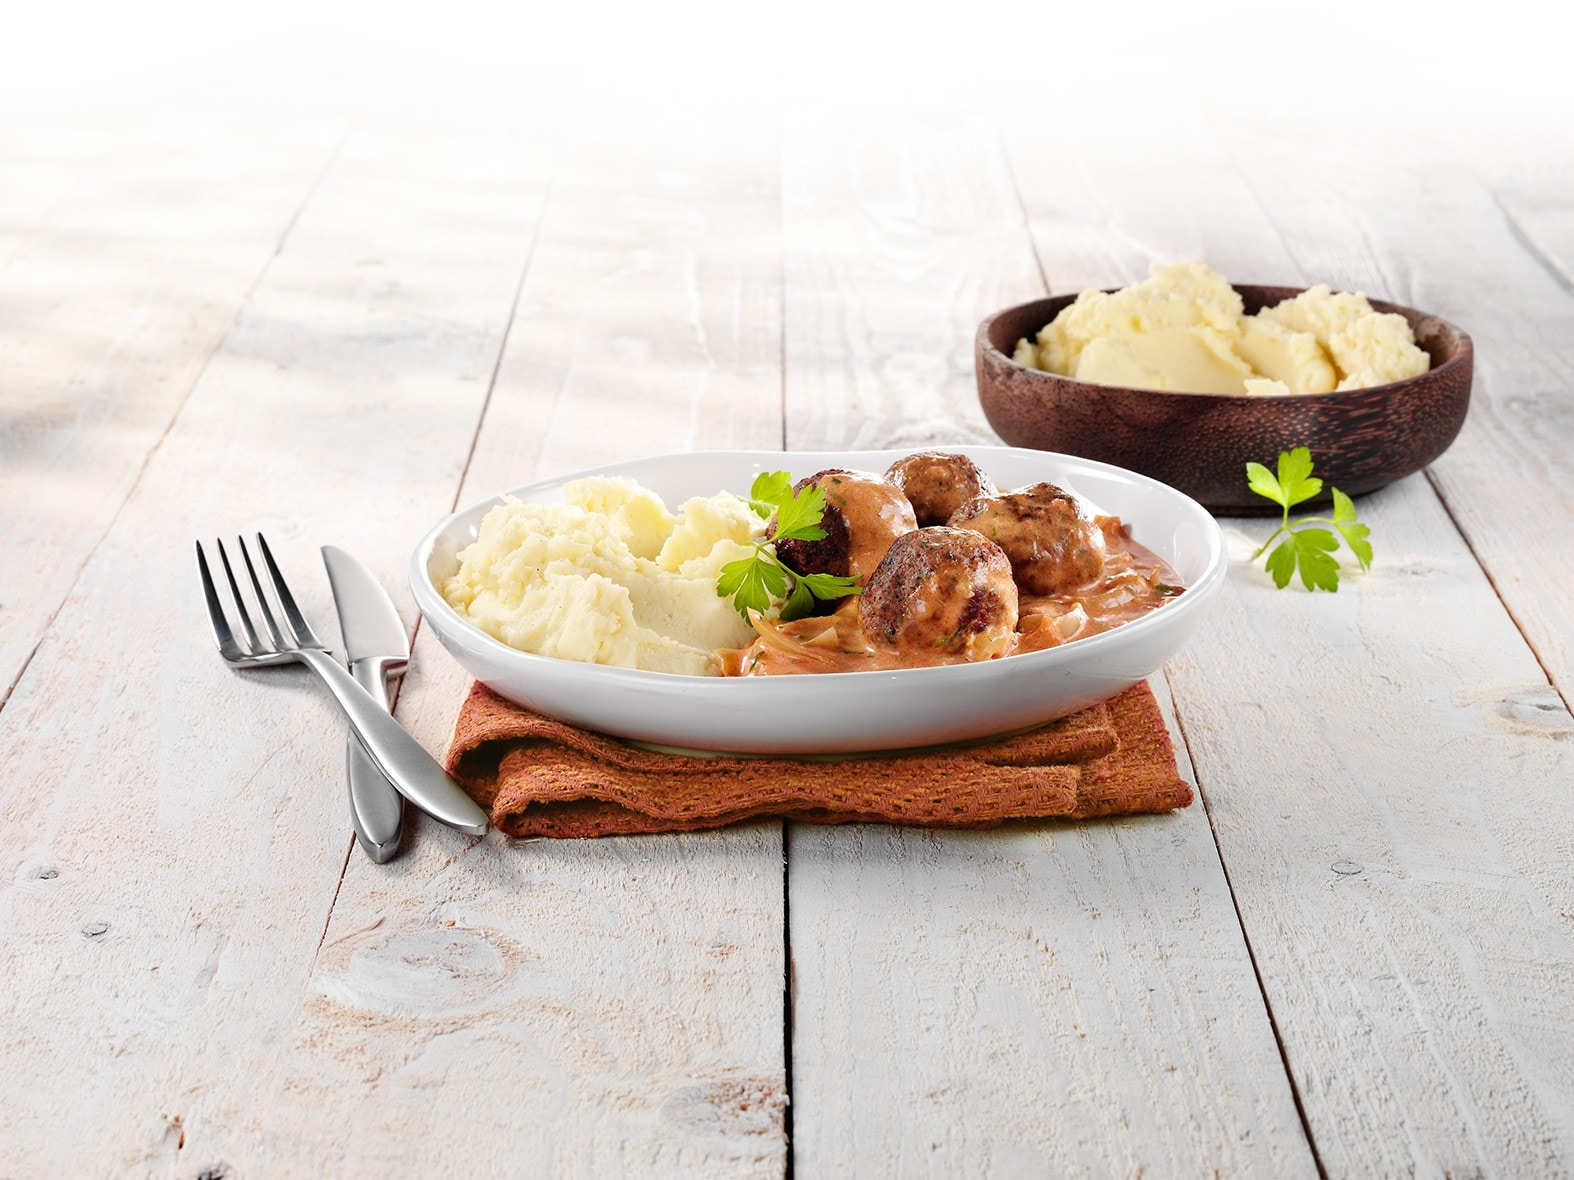 Lamsballetjes met tomatenroomsaus en aardappelpuree